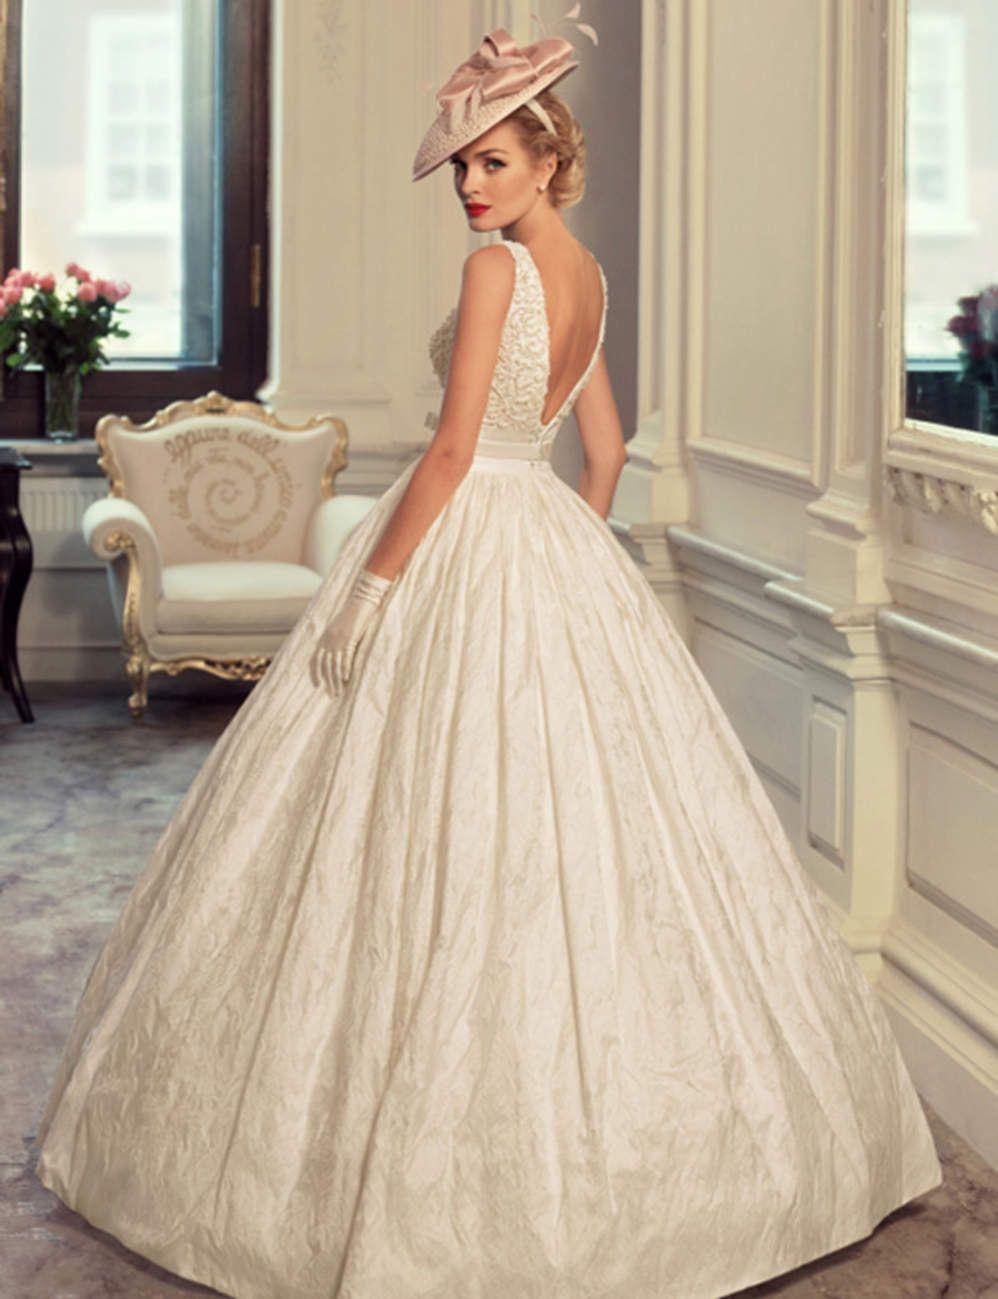 mariage 30 robes de princesses qui font r ver mariage. Black Bedroom Furniture Sets. Home Design Ideas